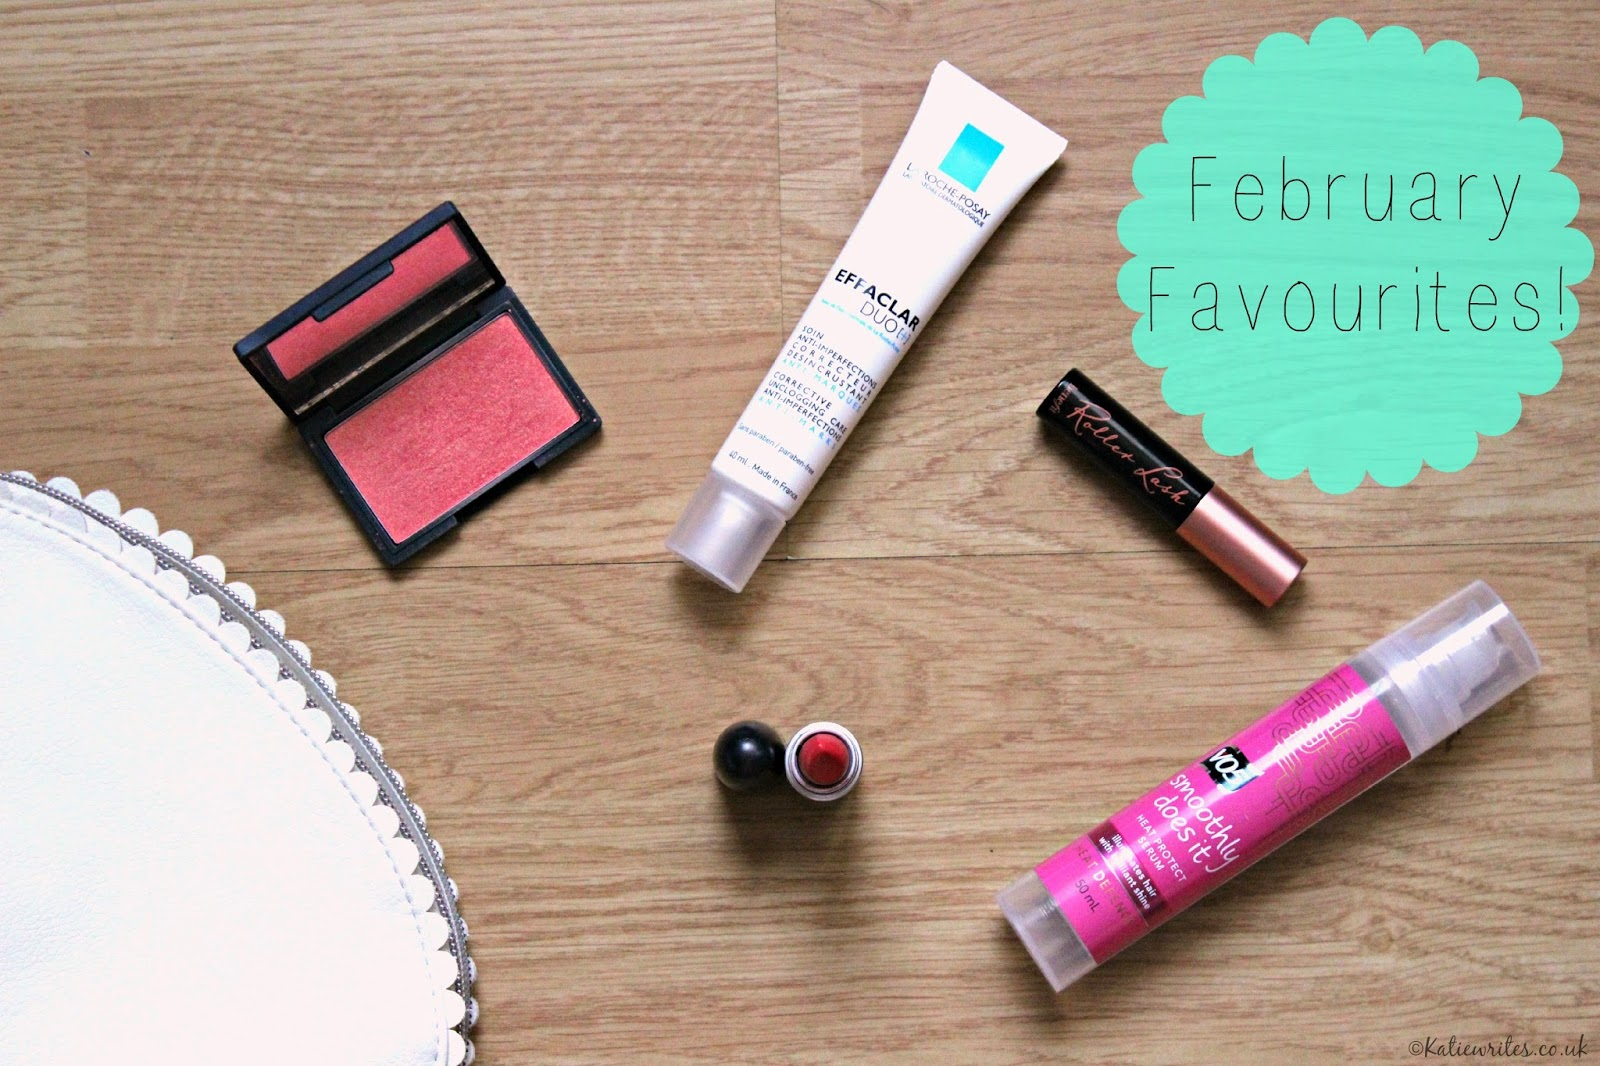 February Favourites!